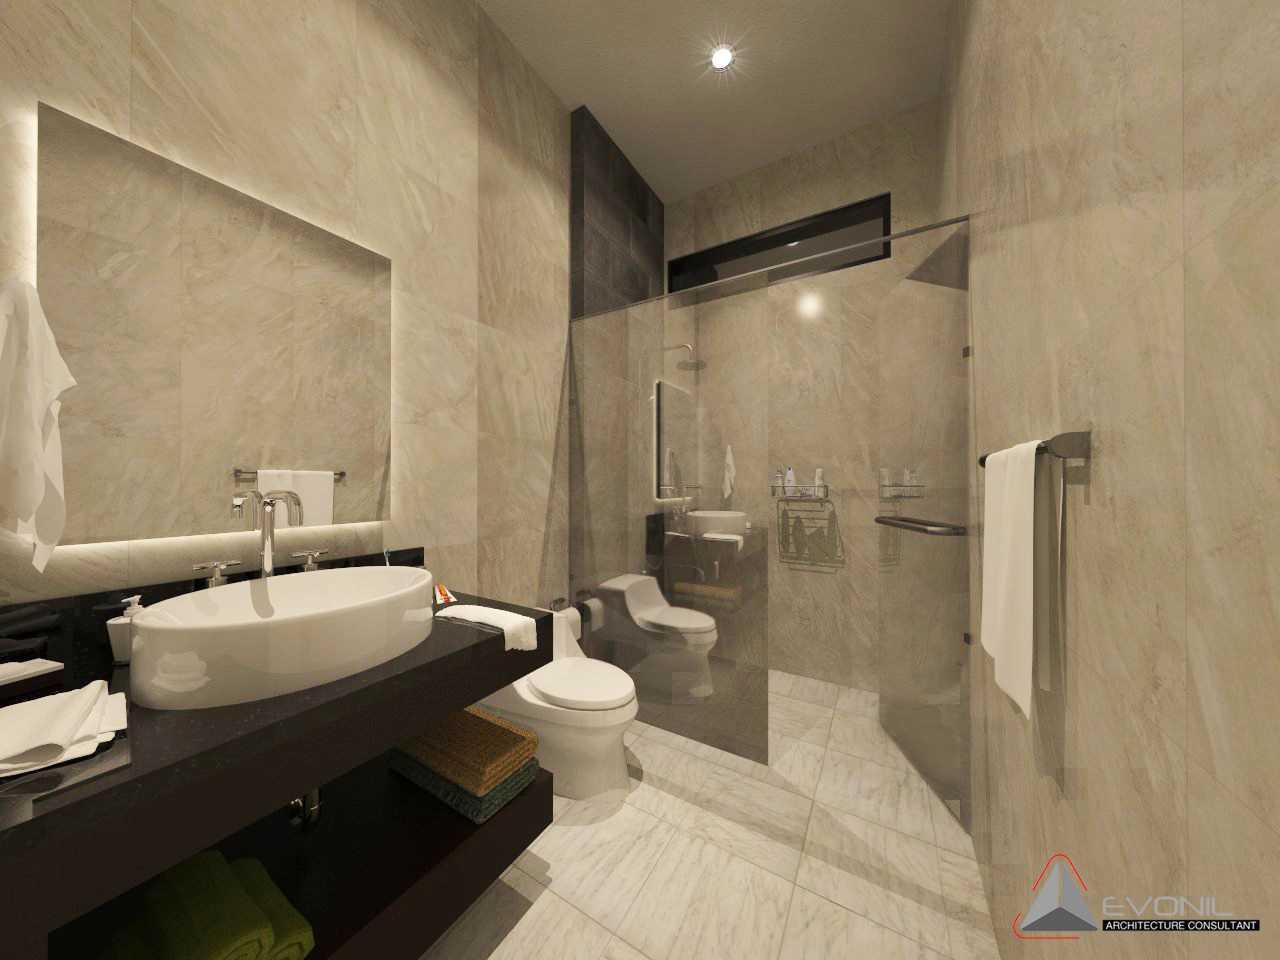 Evonil Architecture Residence Pluit Timur Pluit, Jakarta Pluit, Jakarta Bathroom-2Nd-Floor-Residence-Pluit-Timur Asian  13020